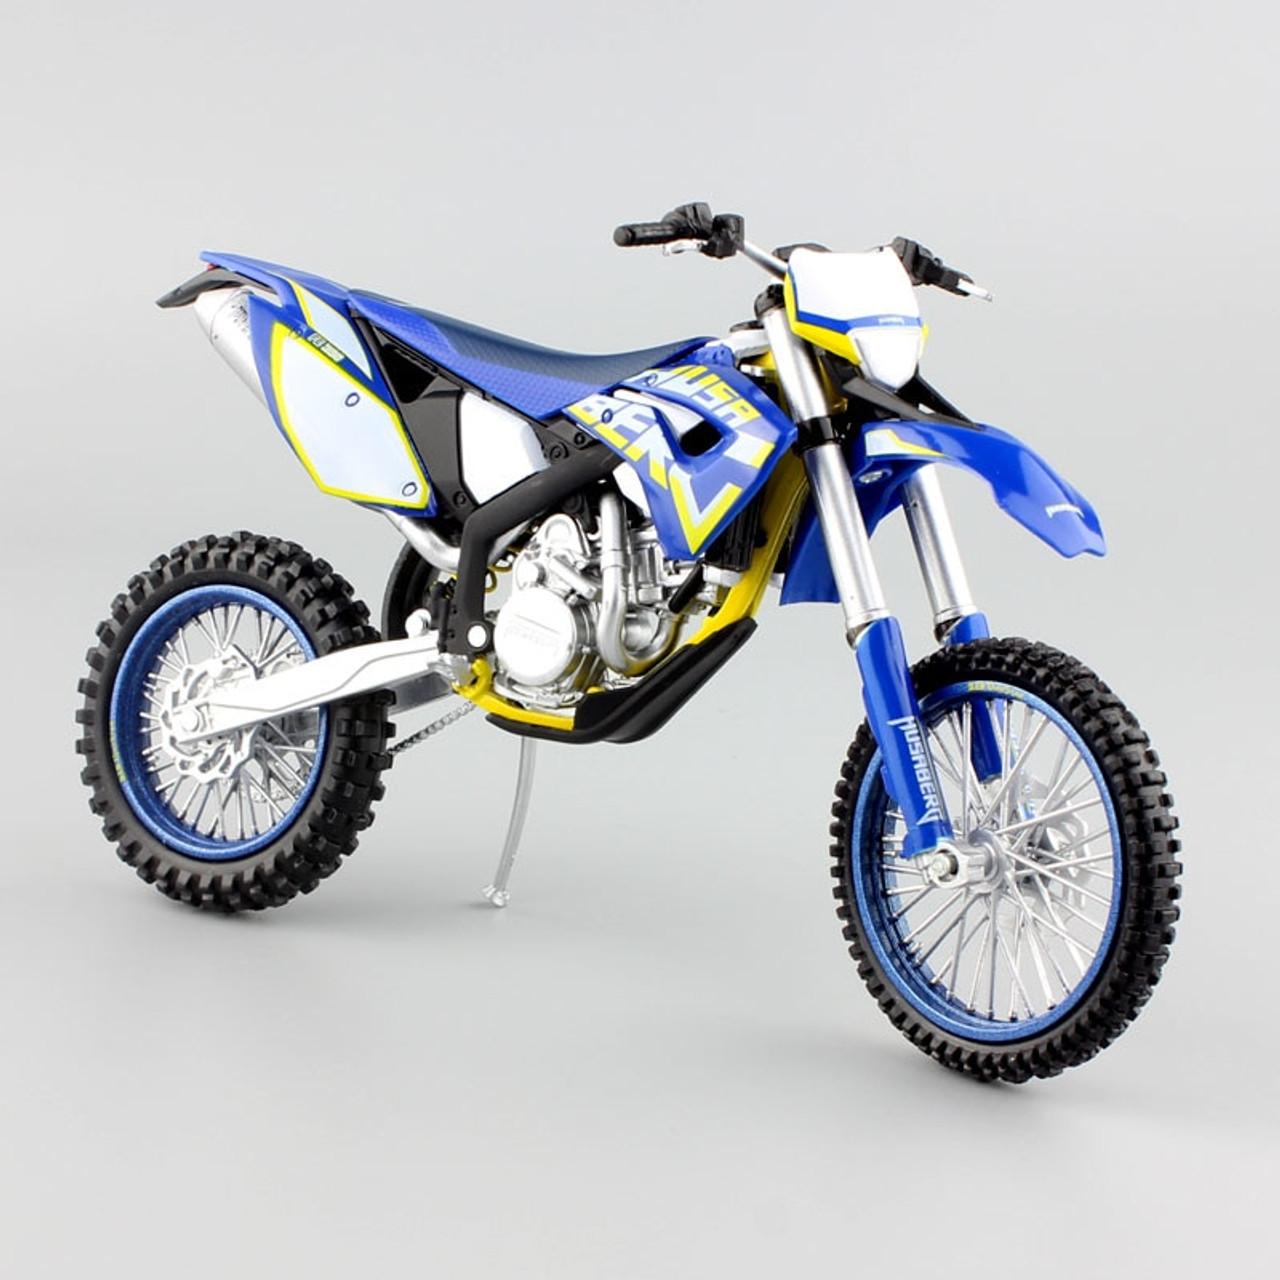 1 12 Scale Children S Ktm Husaberg Fe390 Motorcycle Motocross Dirt Bike Superbike Enduro Diecast Metal Model Race Cars For Boys Onshopdeals Com